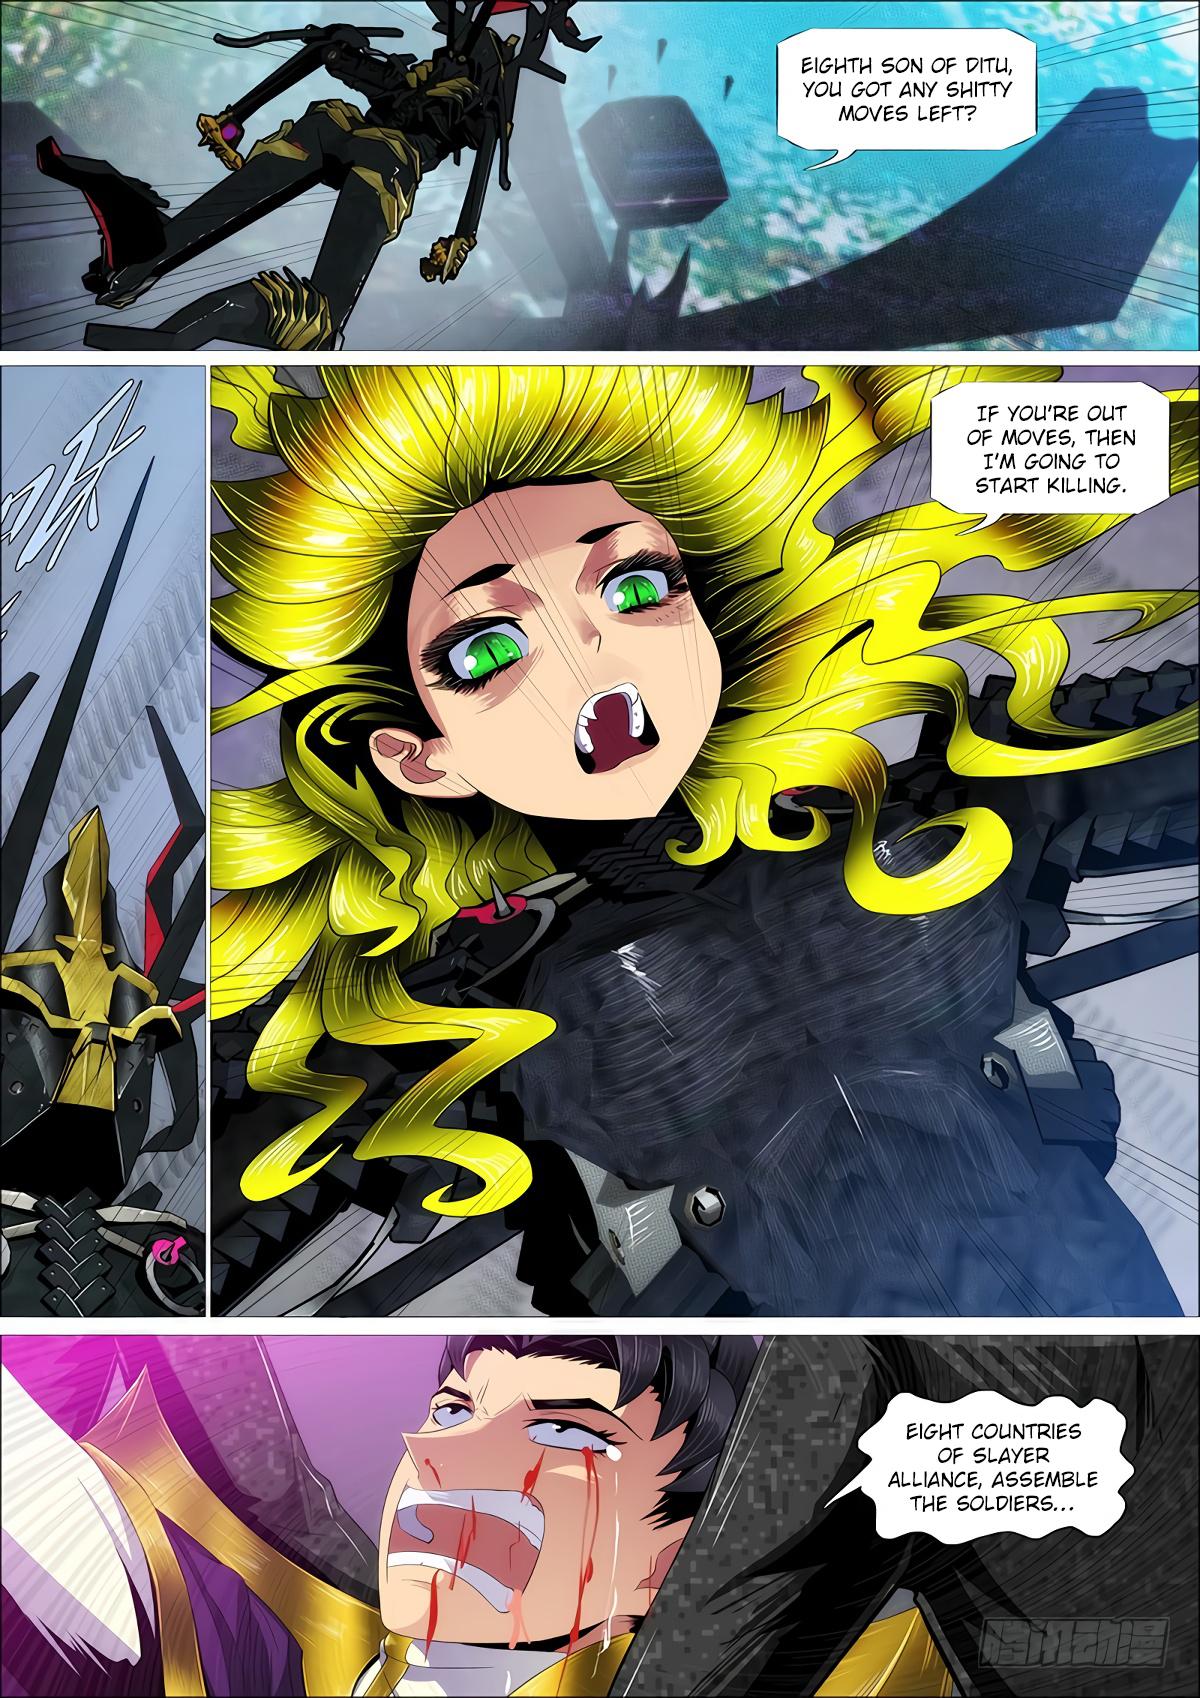 https://manga.mangadogs.com/comics/pic4/59/24443/2649956/38550e6ffde6df7c36680aa1ac11906f.jpg Page 1